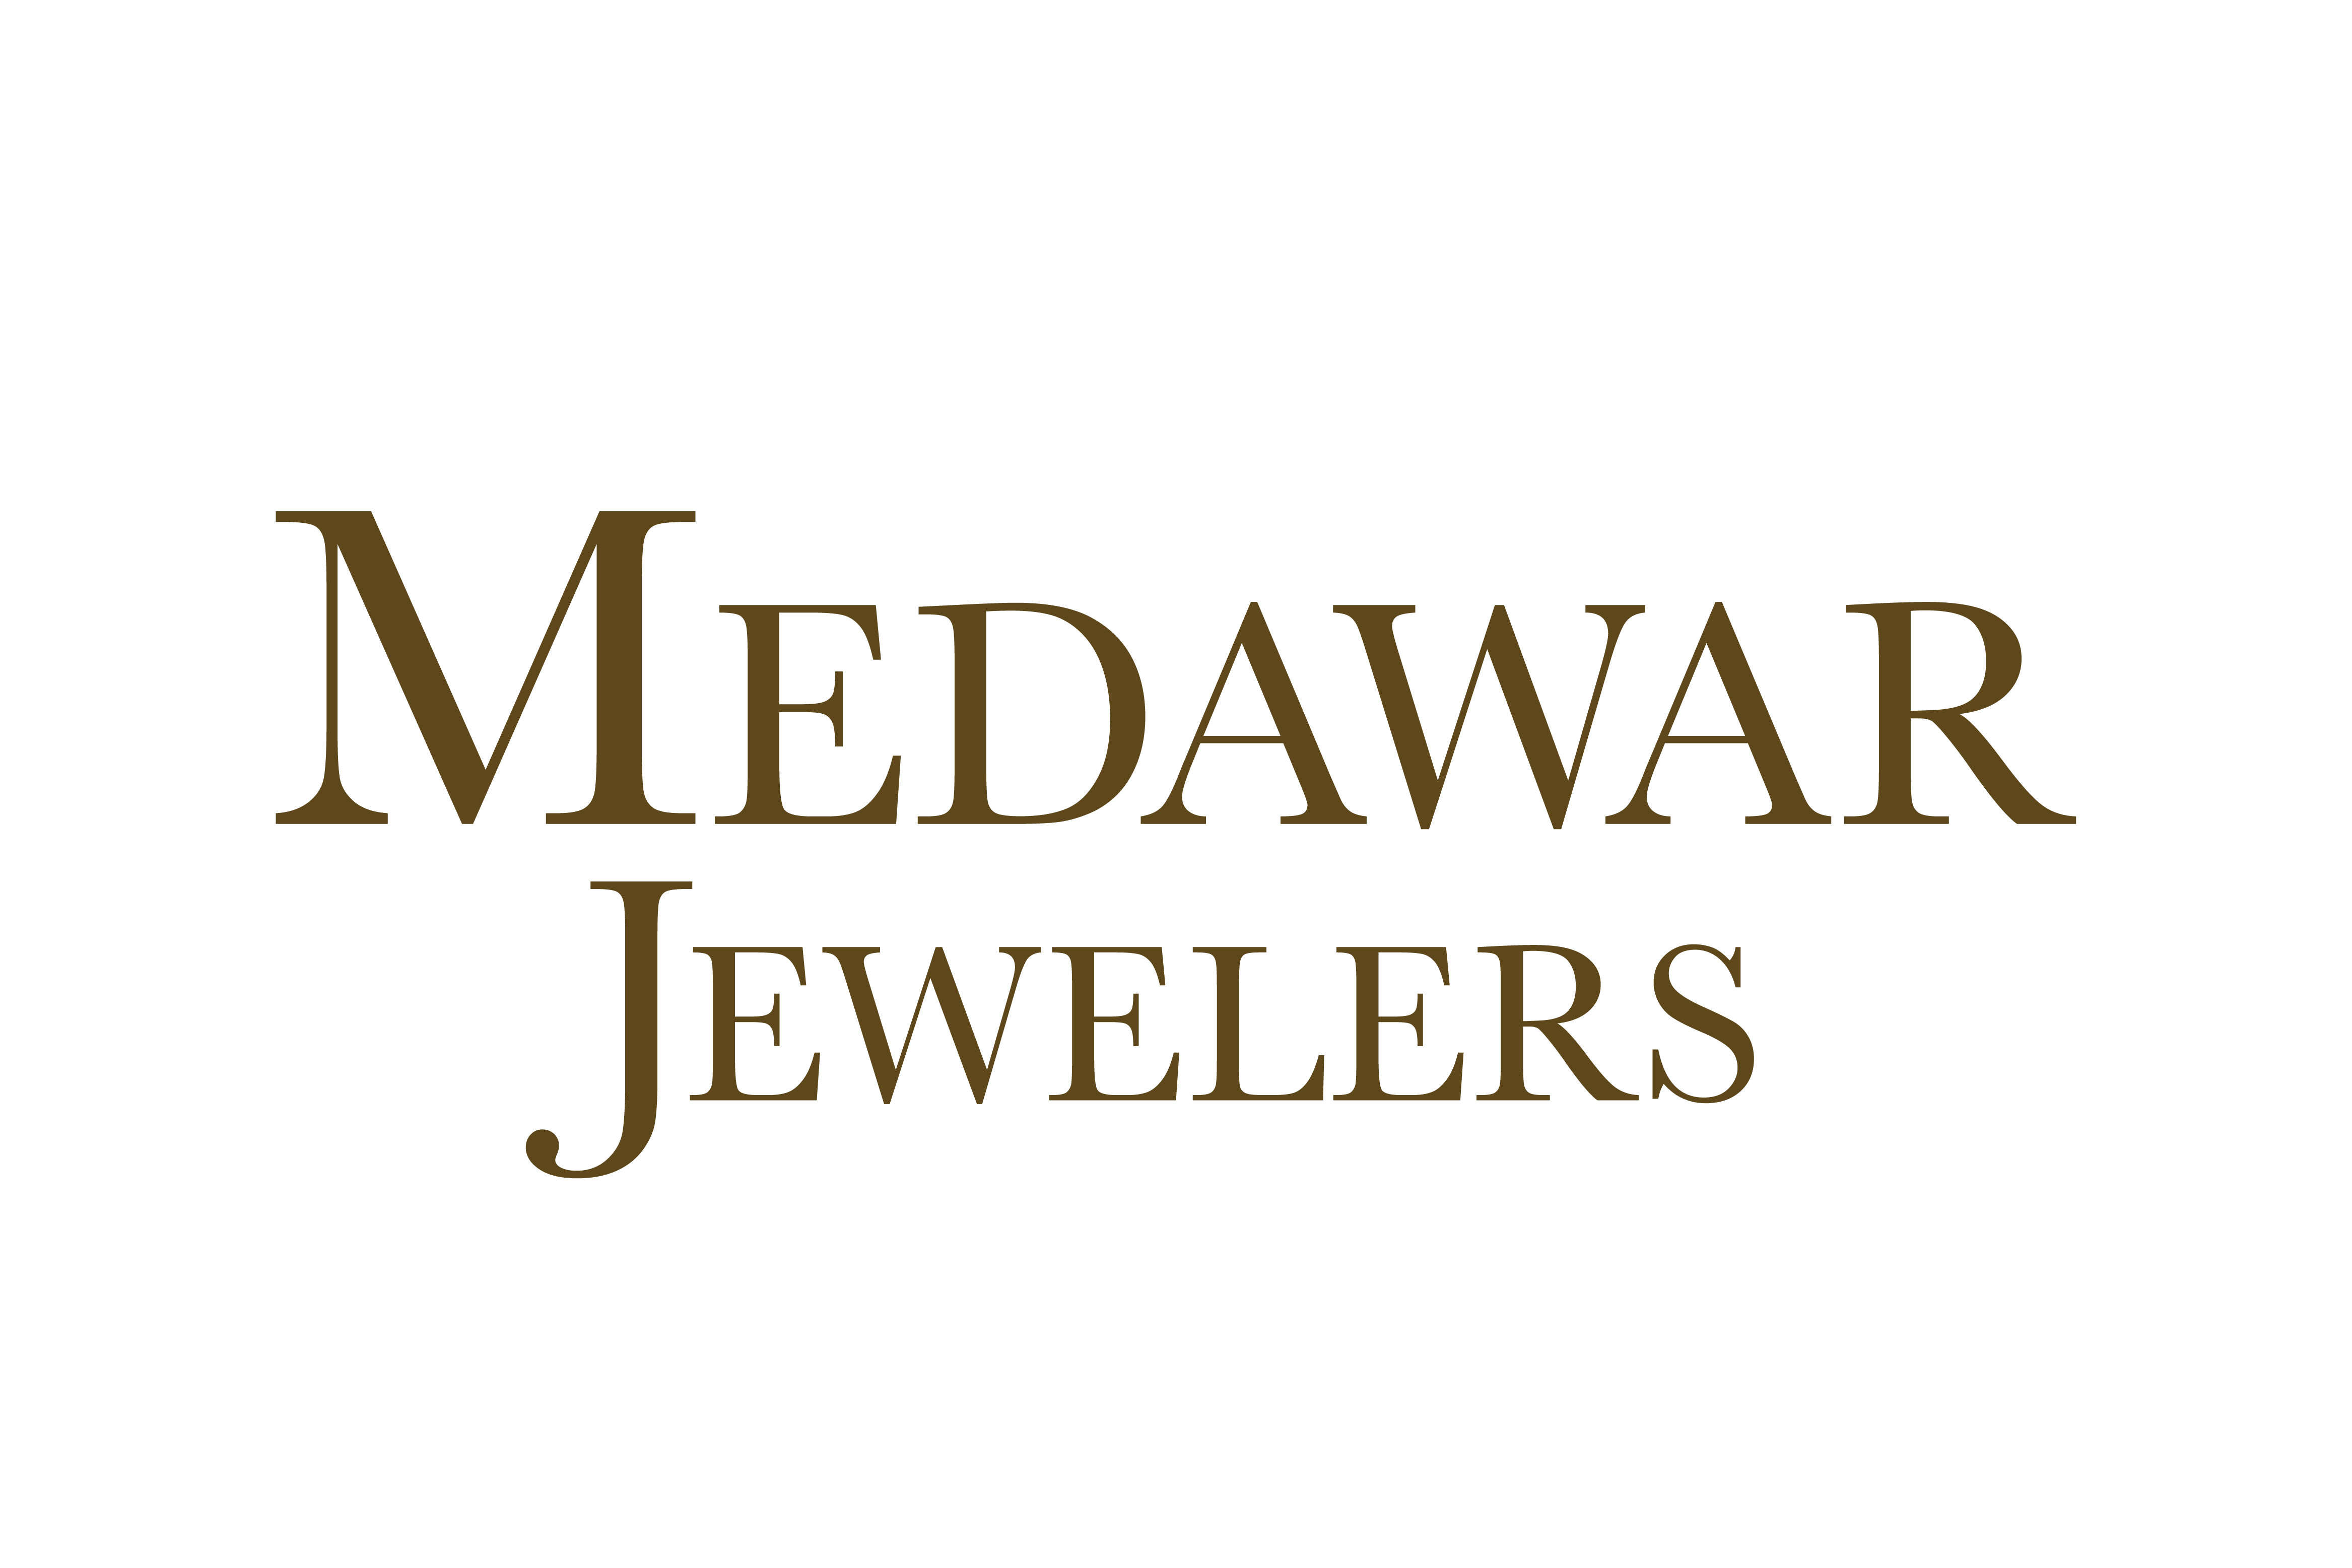 Medawar-Jewelers-Logo